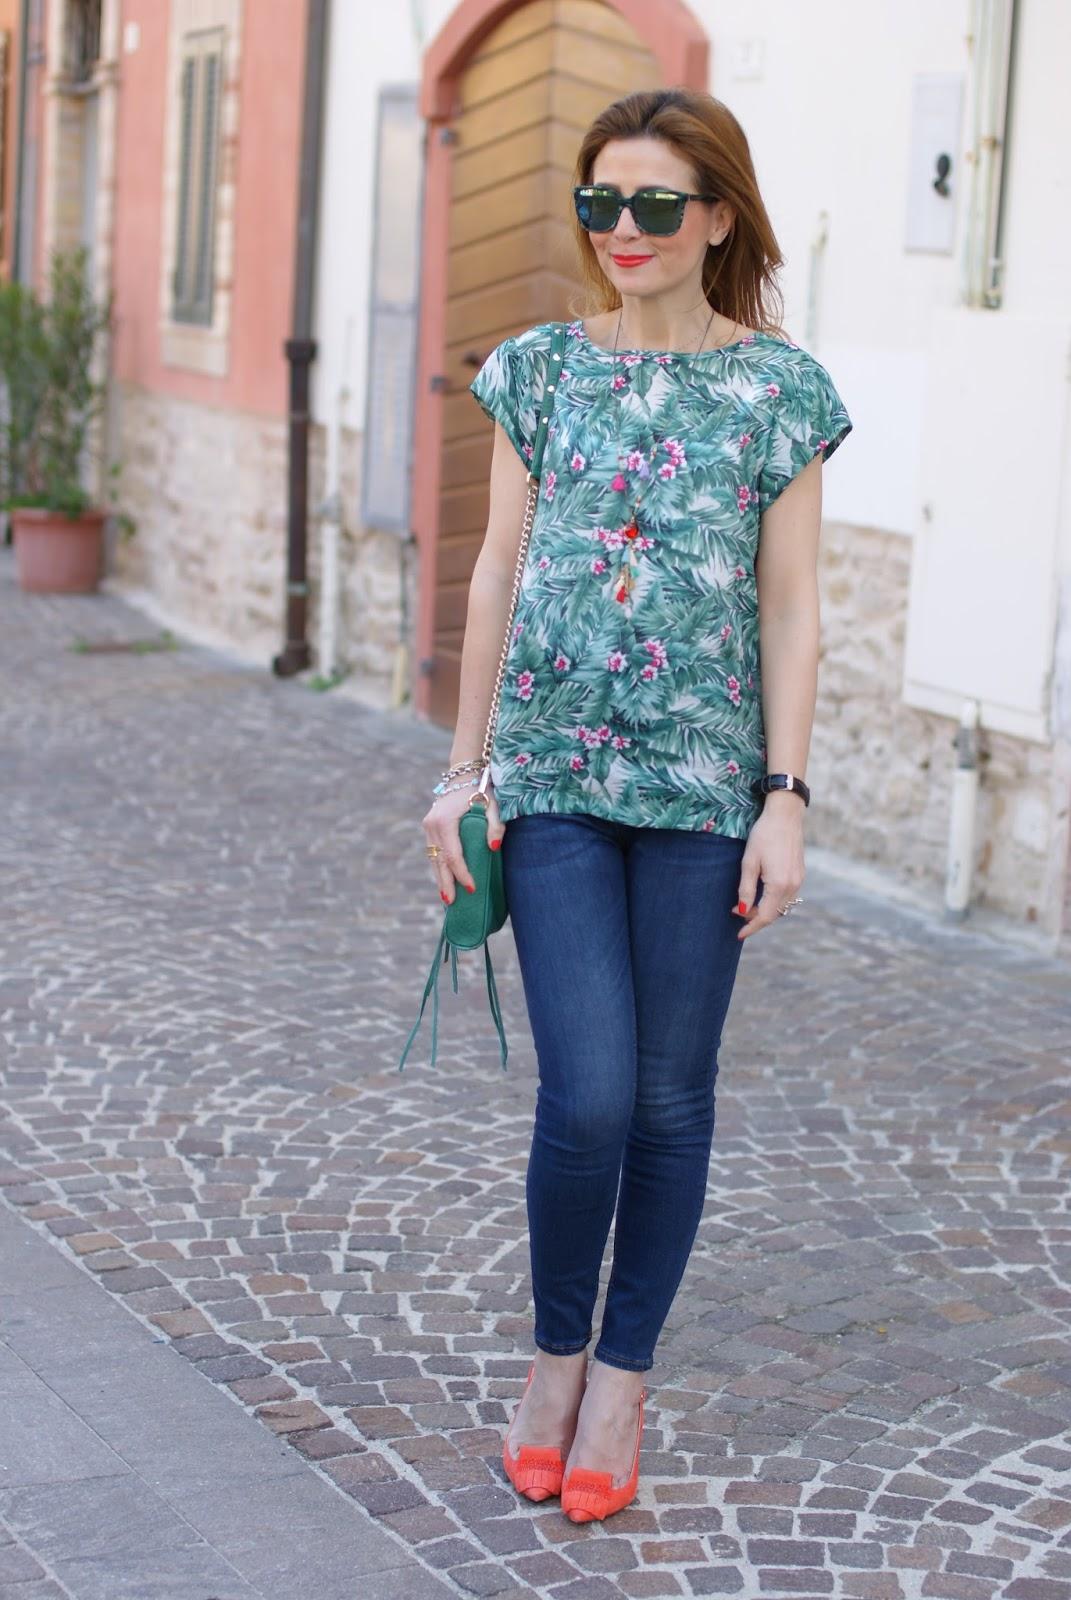 Hype Glass sunglasses and Mismash tropical print Askani t-shirt on Fashion and Cookies fashion blog, fashion blogger style